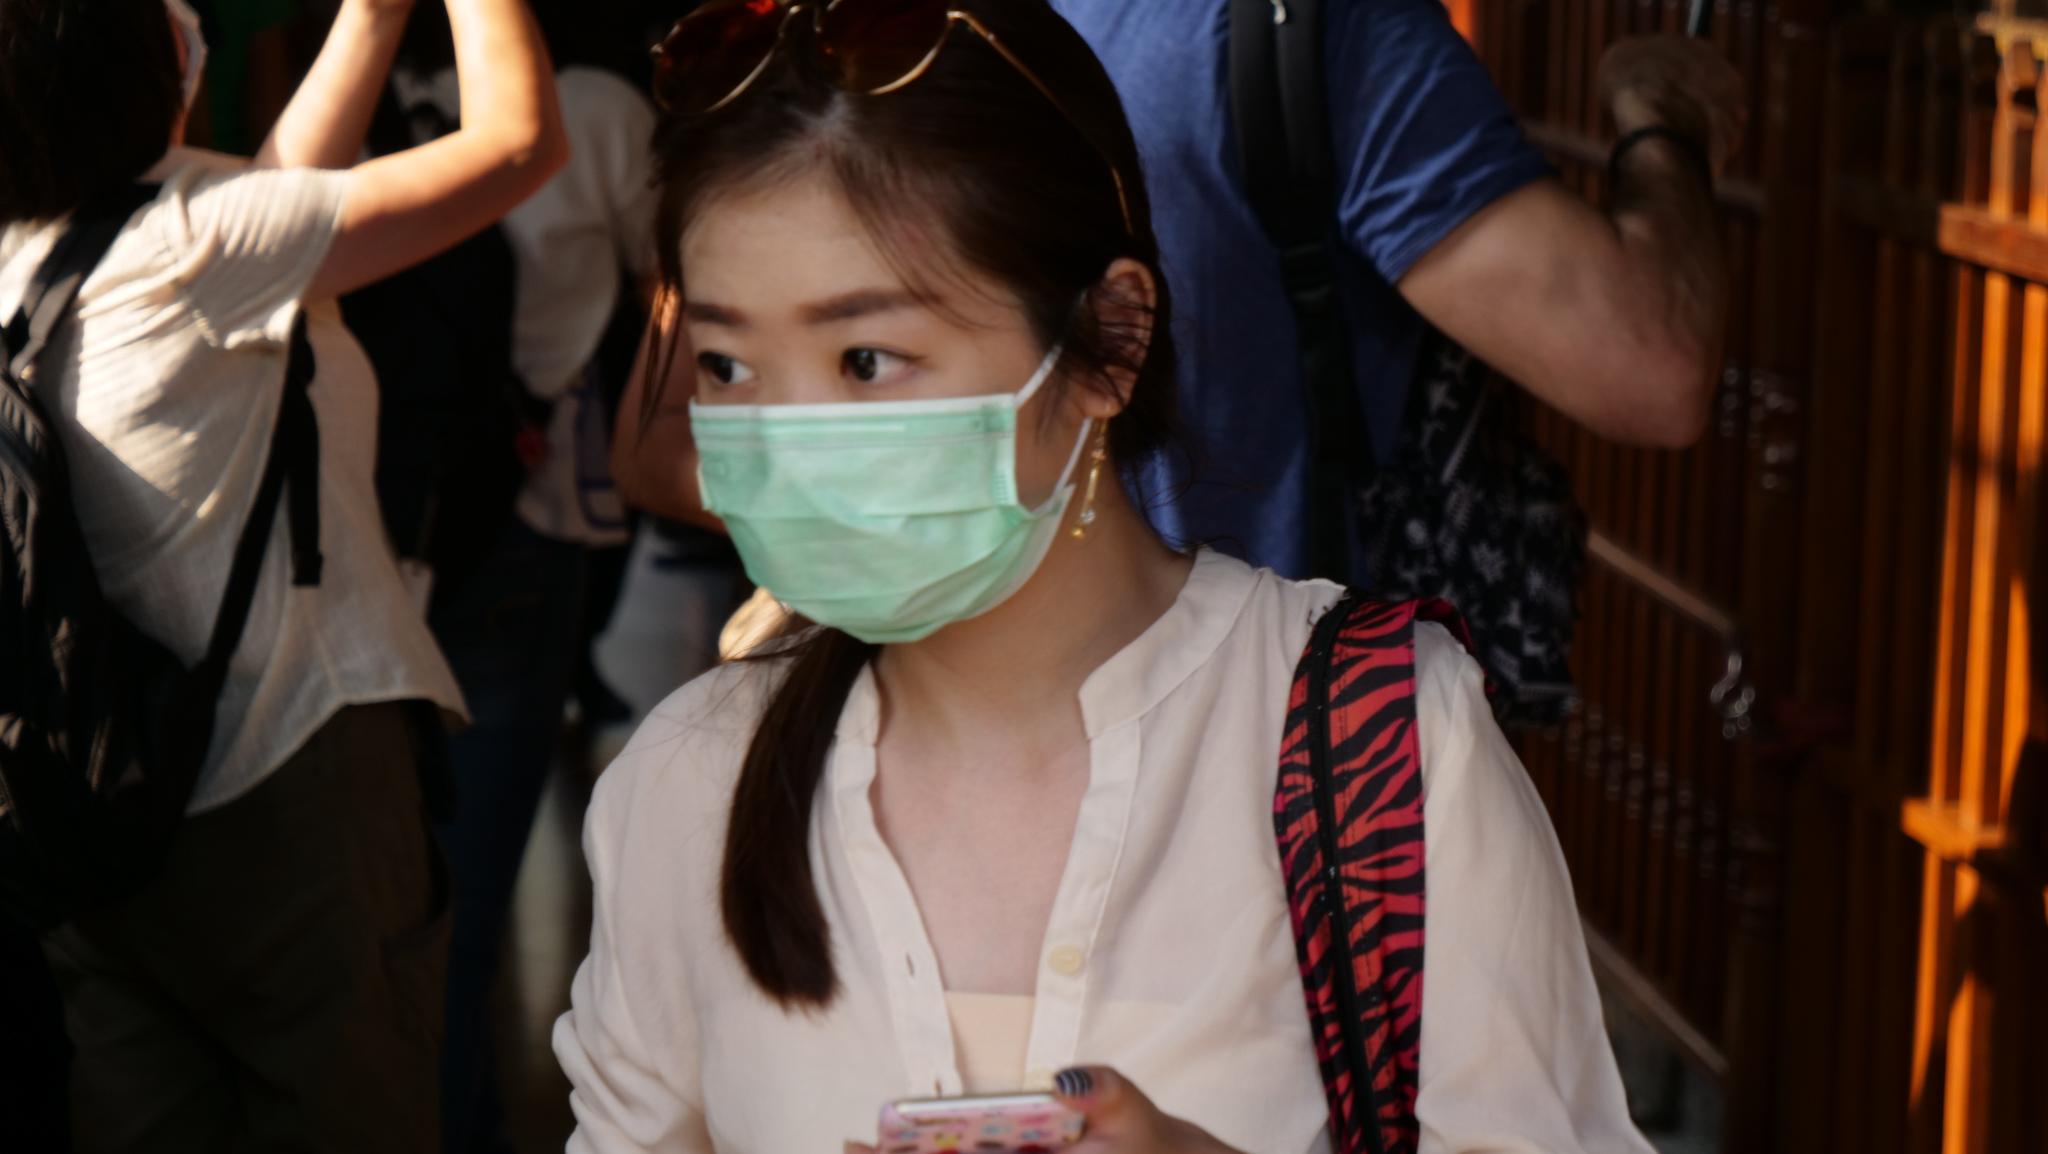 Turista, en Tailandia.